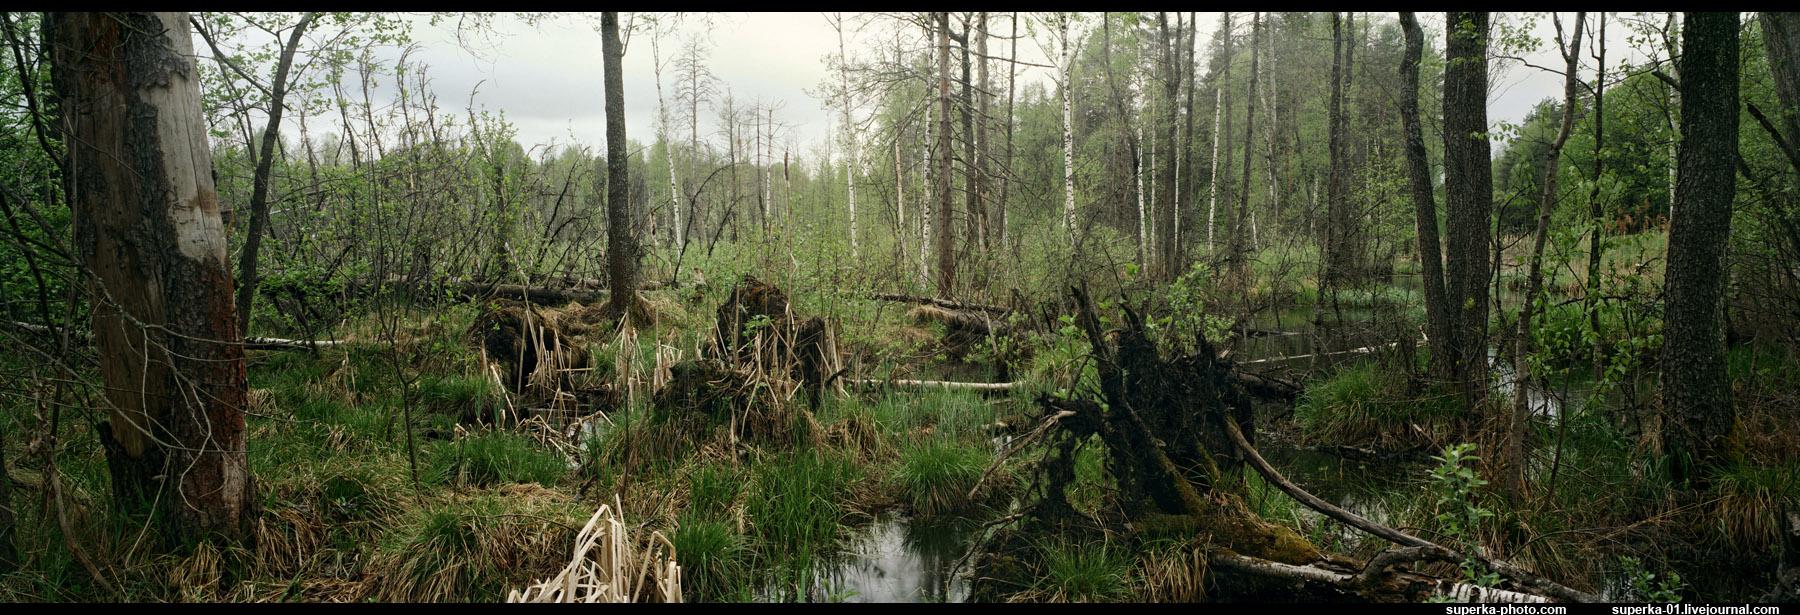 три юрское болото картинки нервный тик